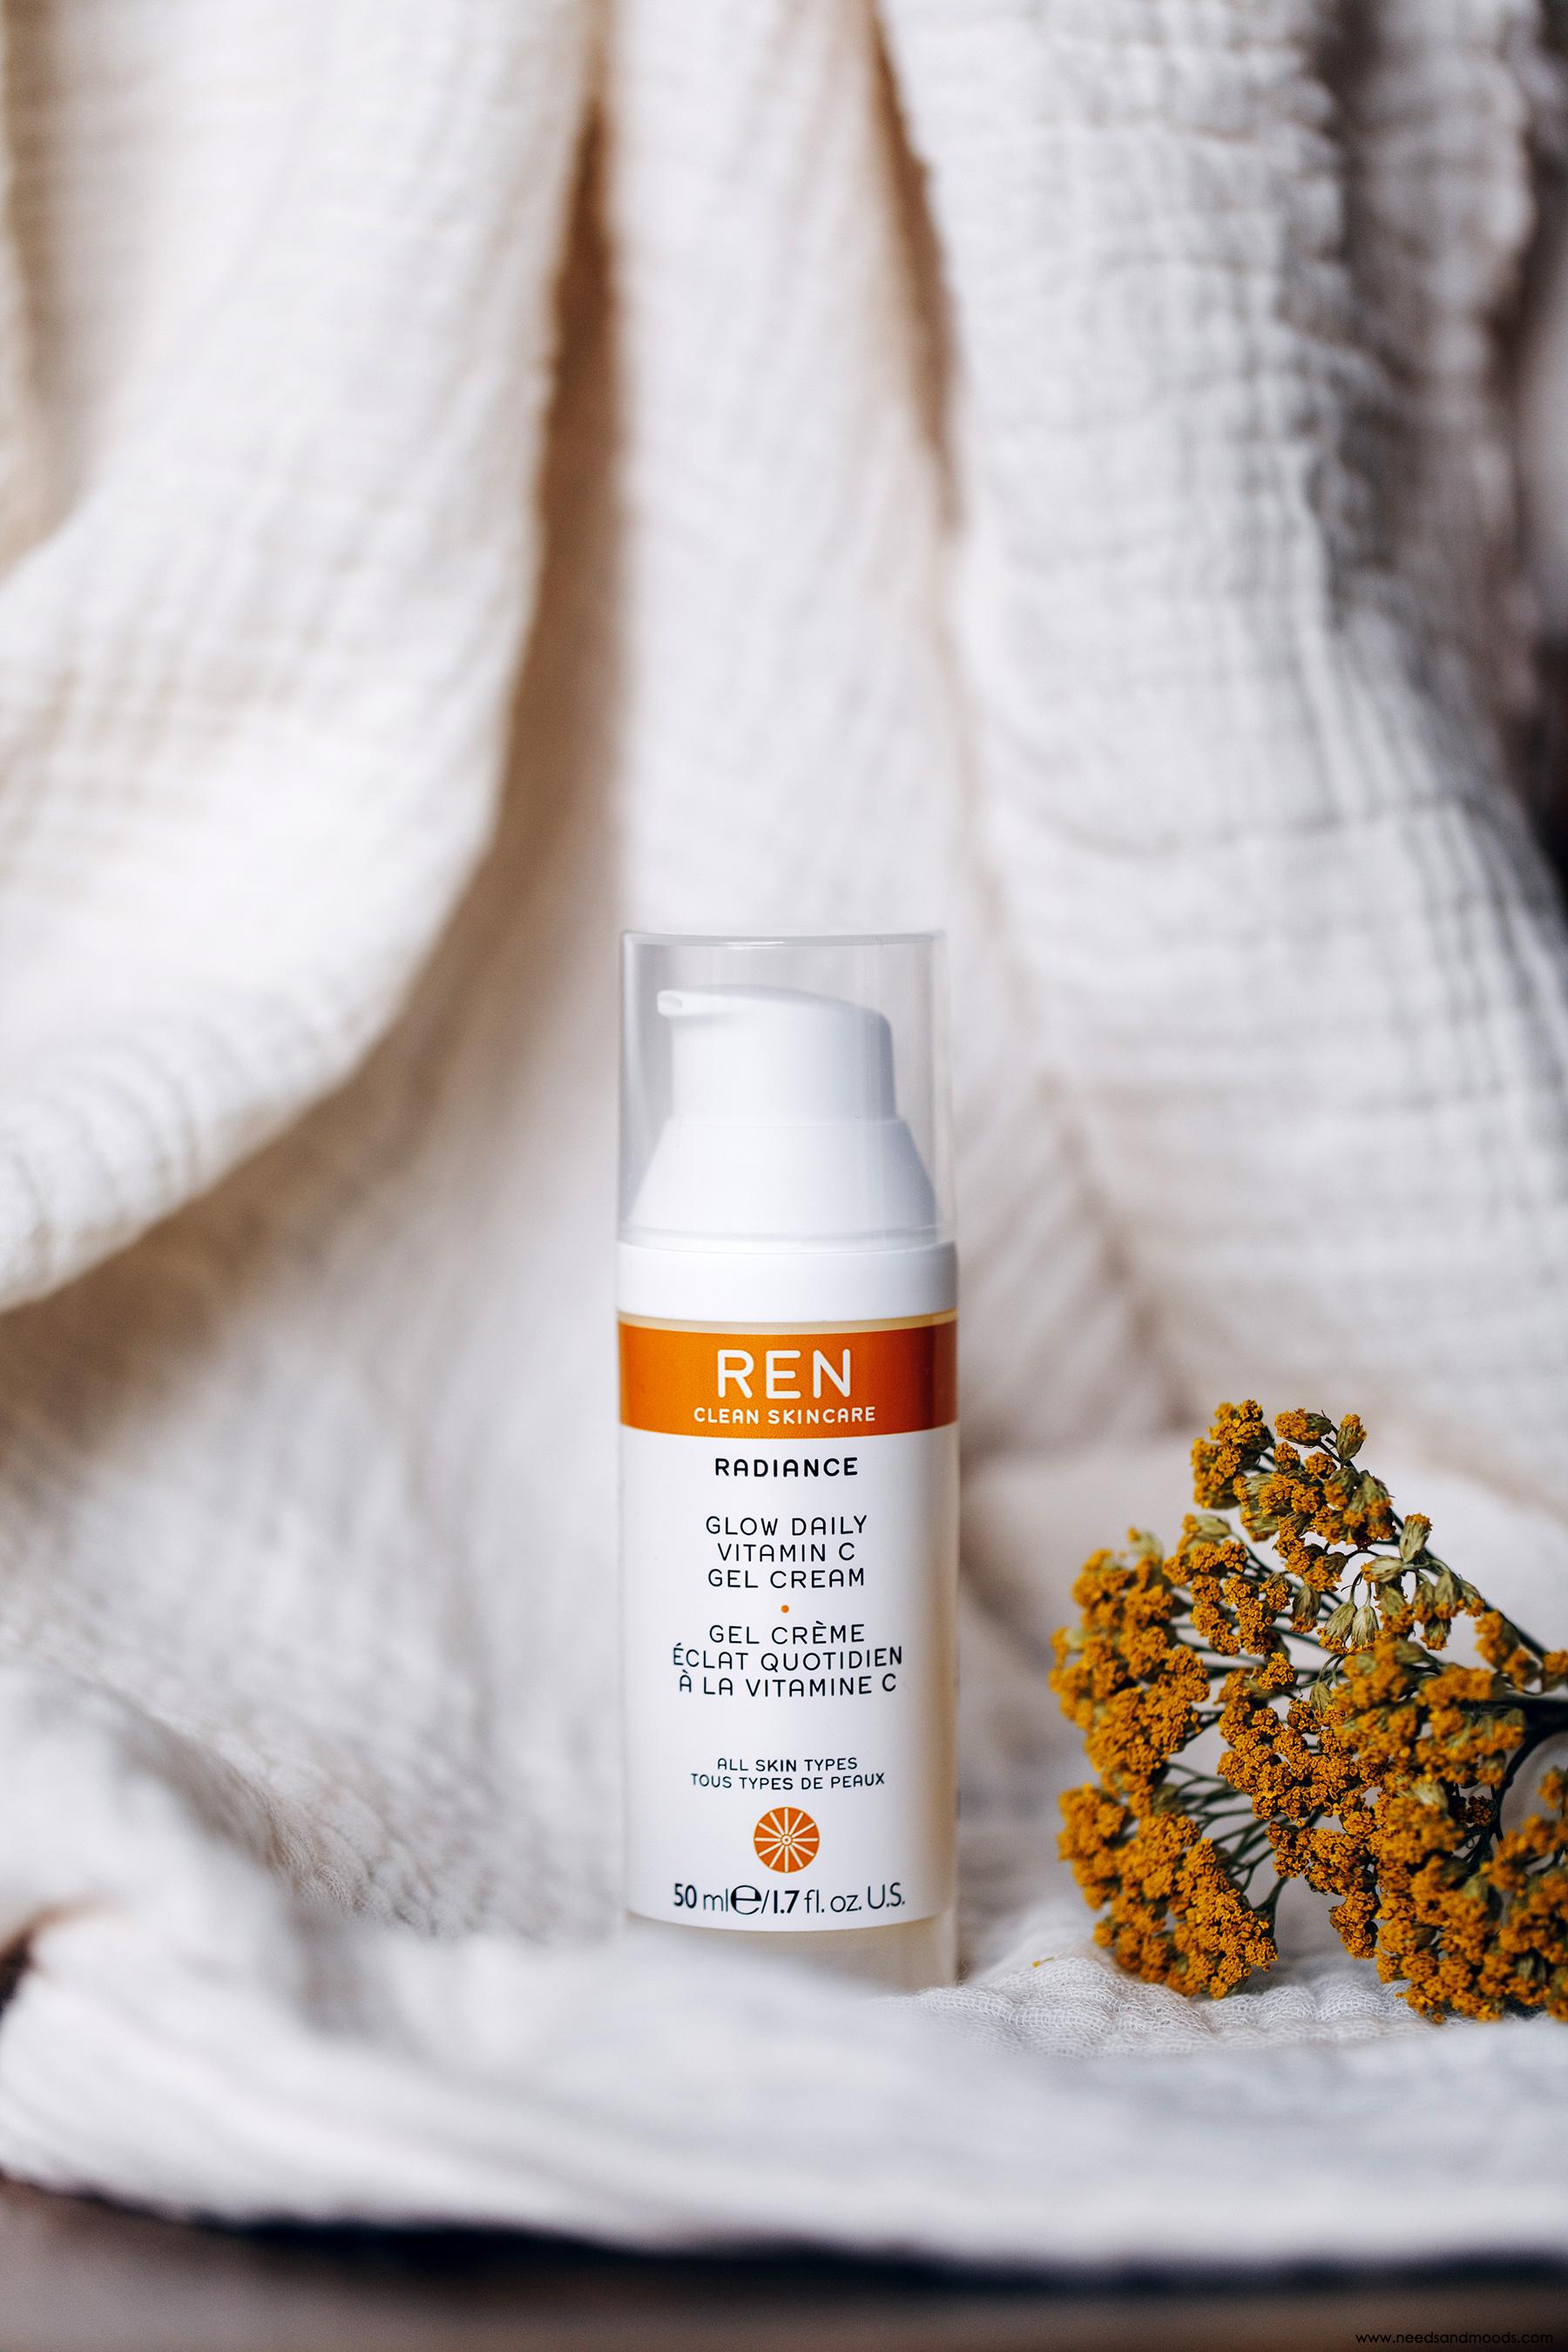 REN Glow Daily Vitamine C Gel Cream